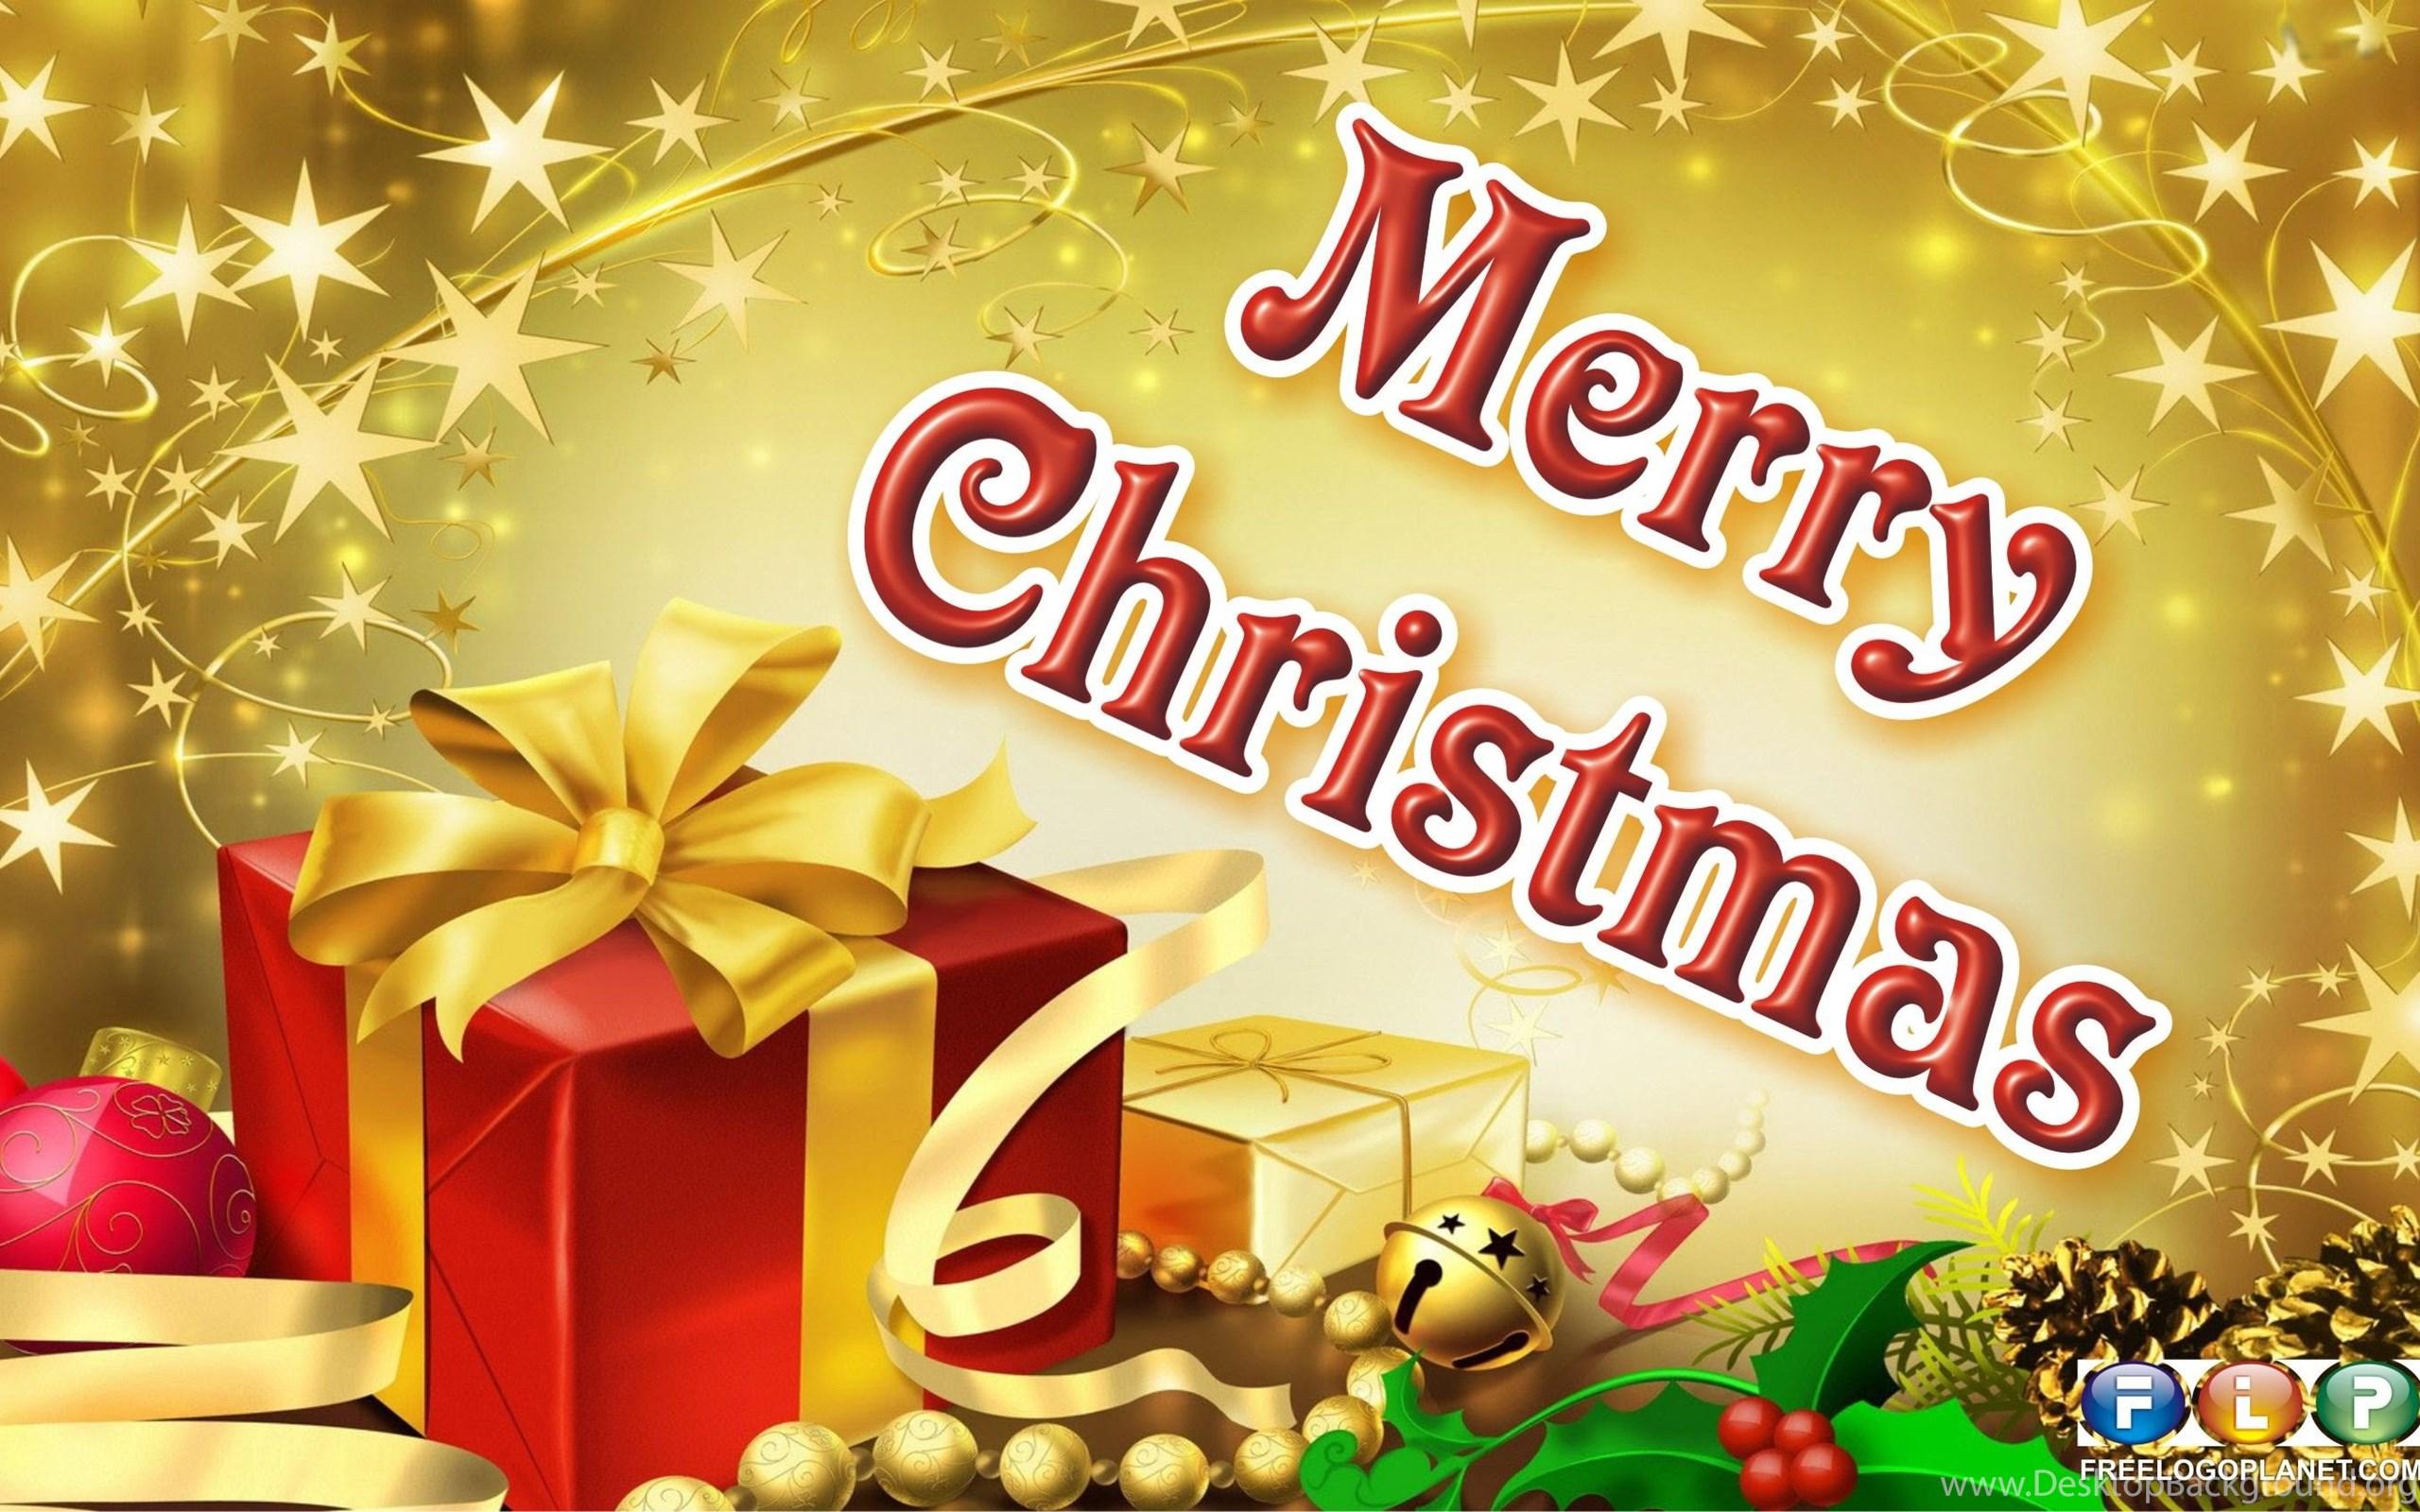 Happy Christmas Day 2015 SMS Desktop Background